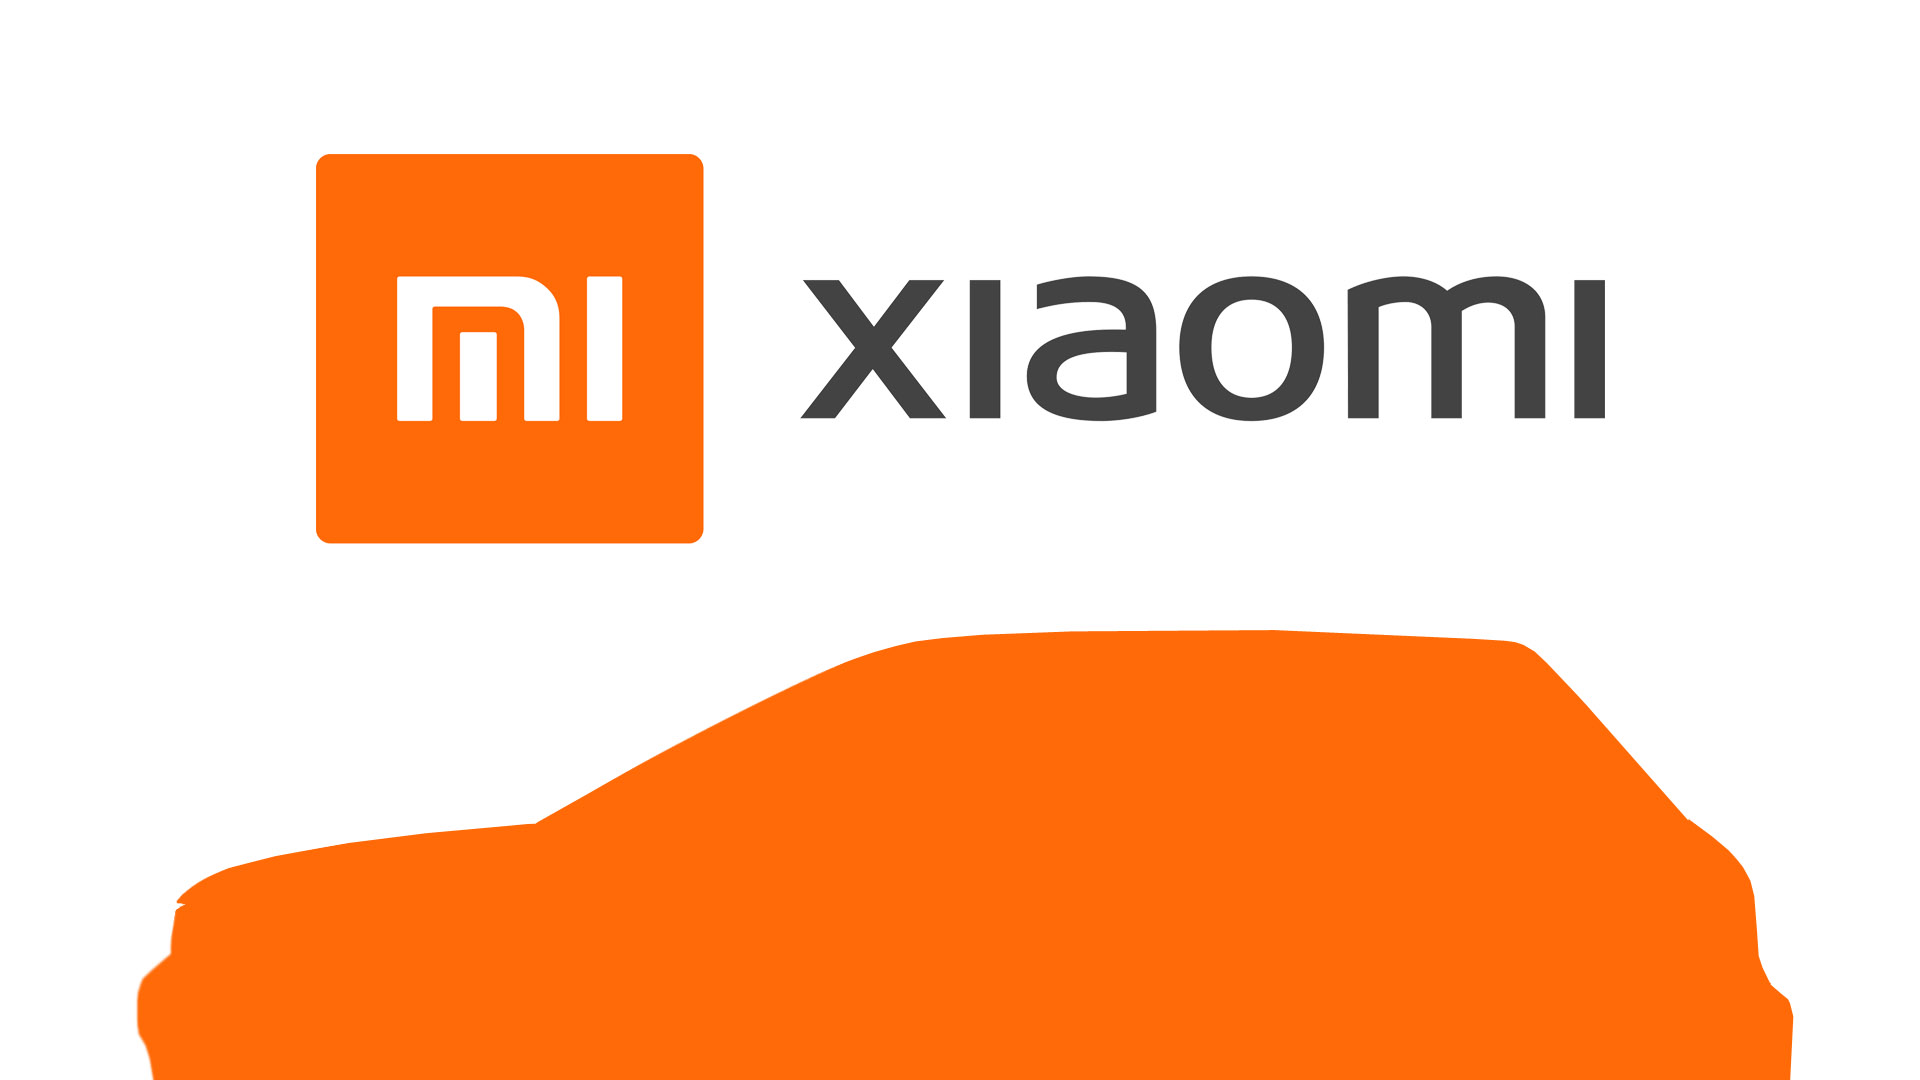 Xiaomi: Επένδυση μαμούθ για άμεση εξέλιξη ηλεκτρικού αυτοκινήτου